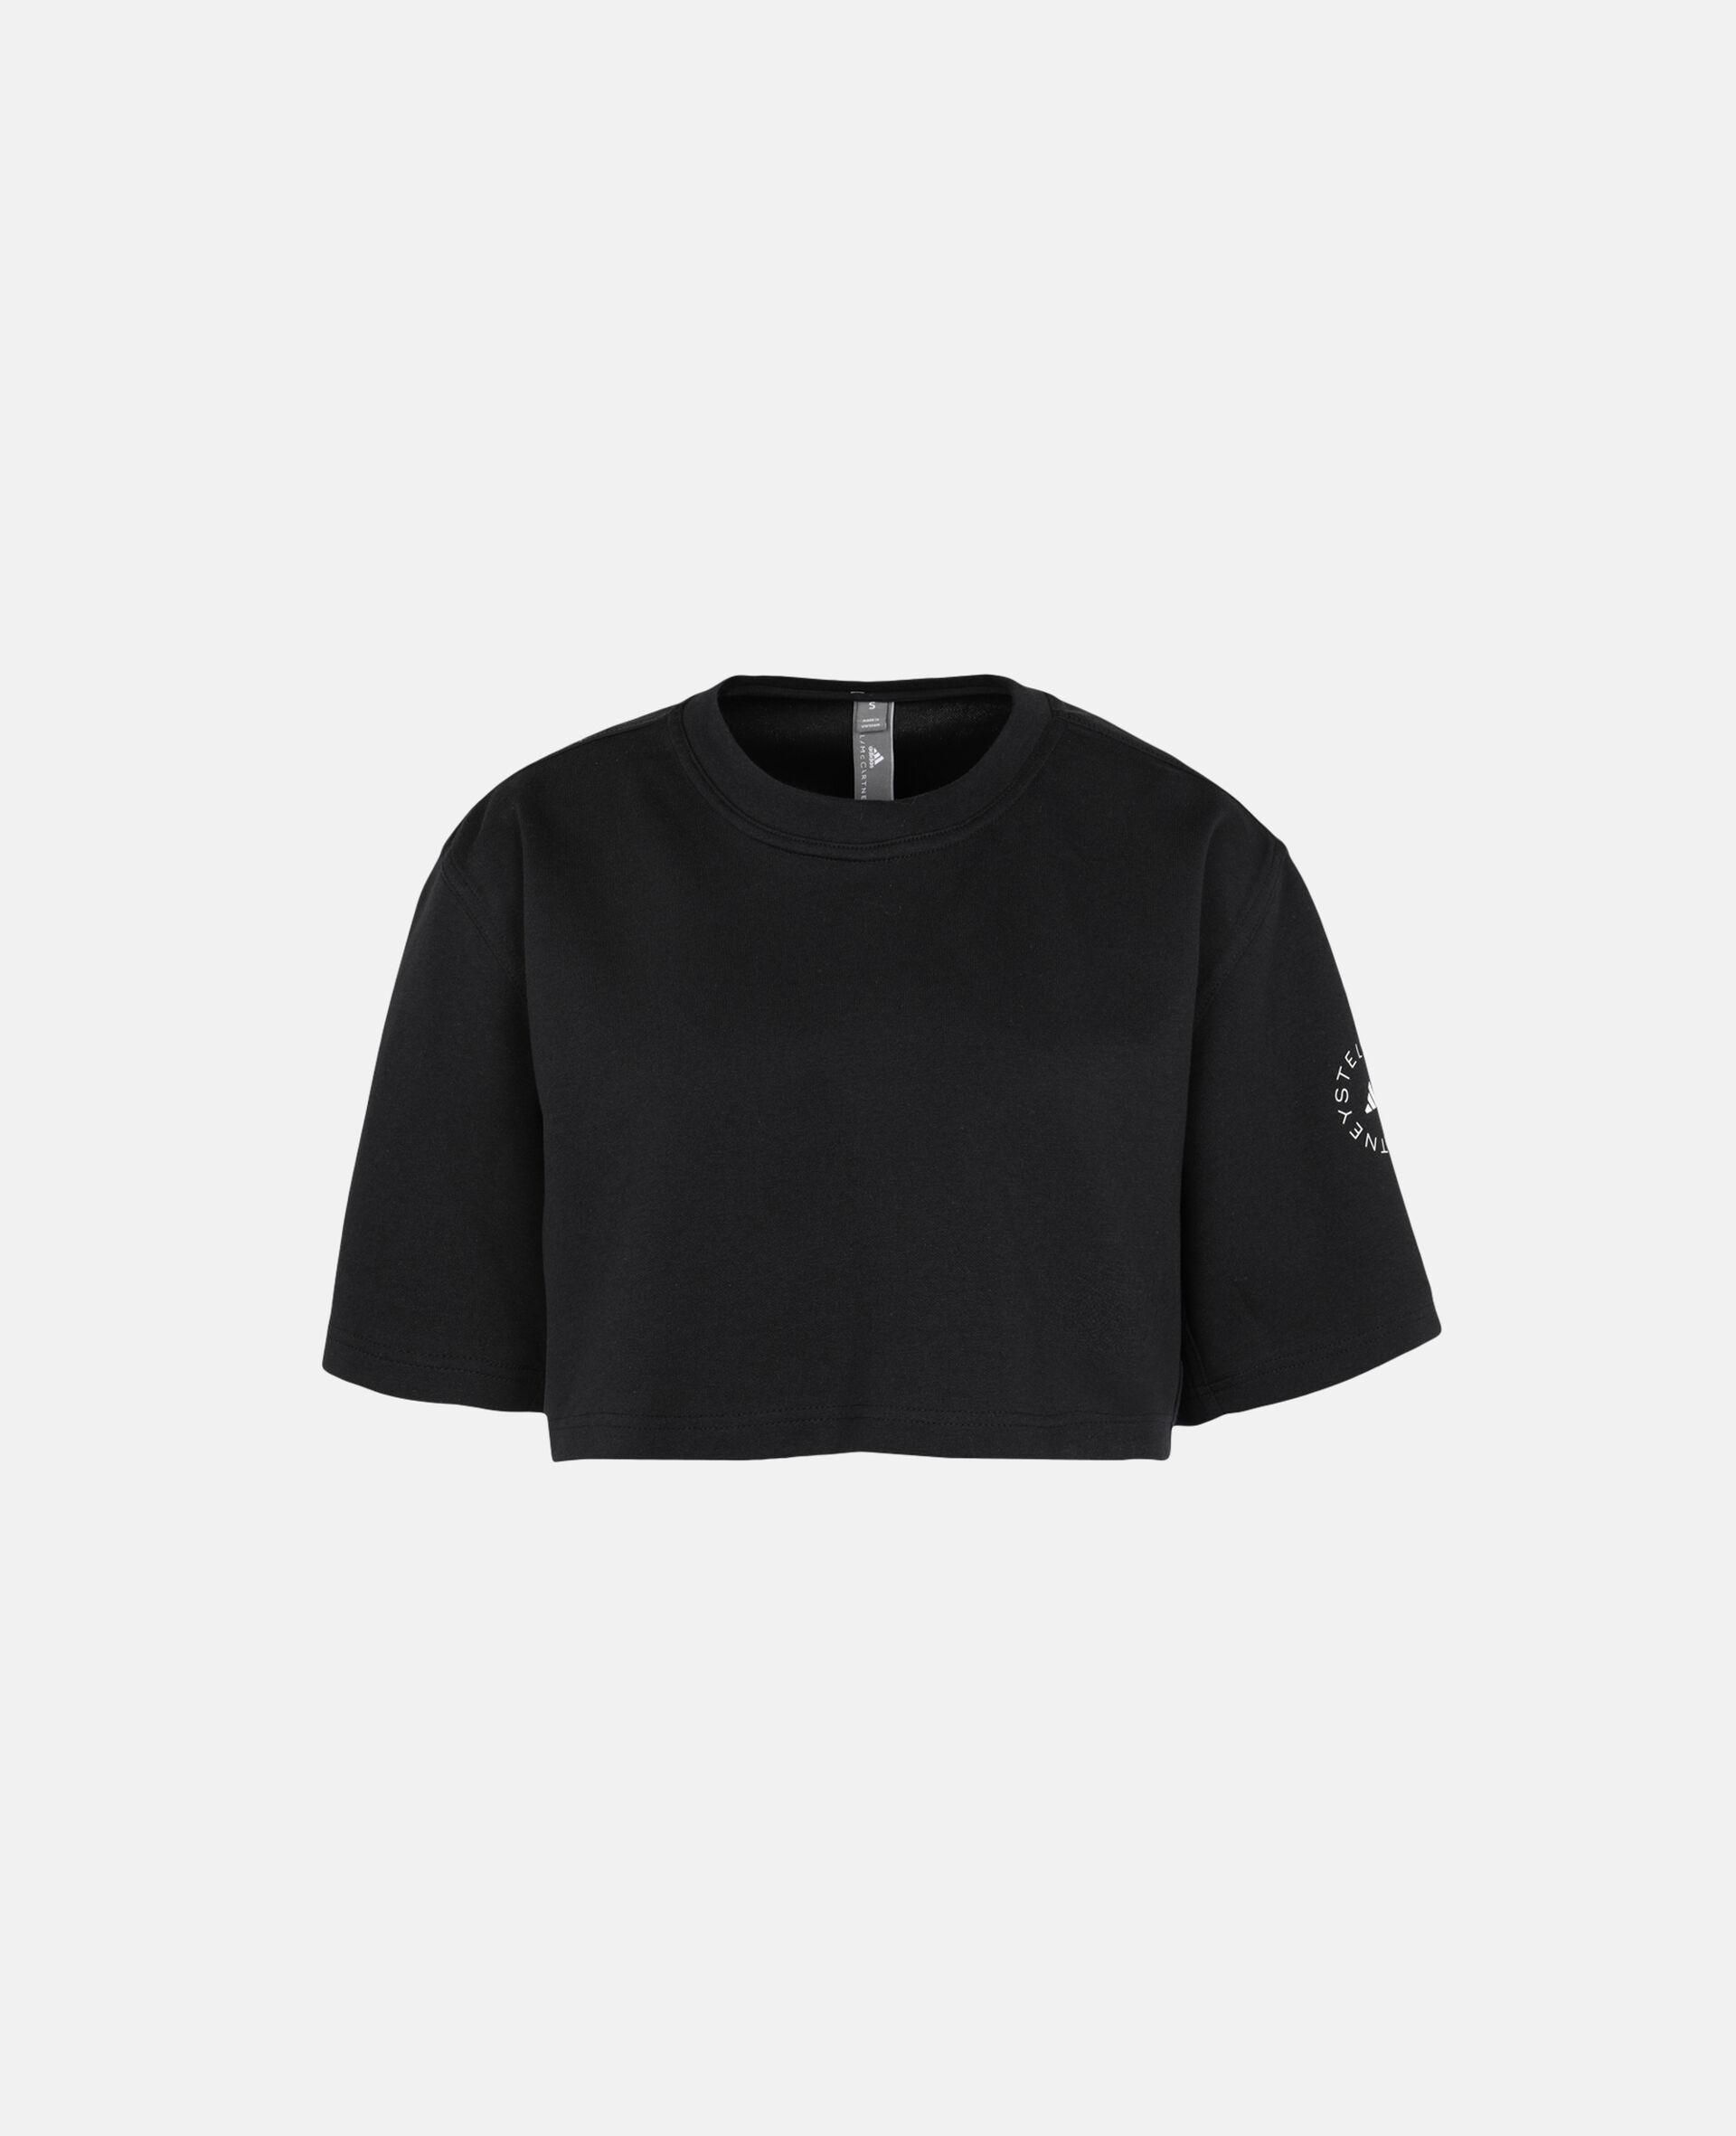 Future Playground Crop T-Shirt-Black-large image number 0